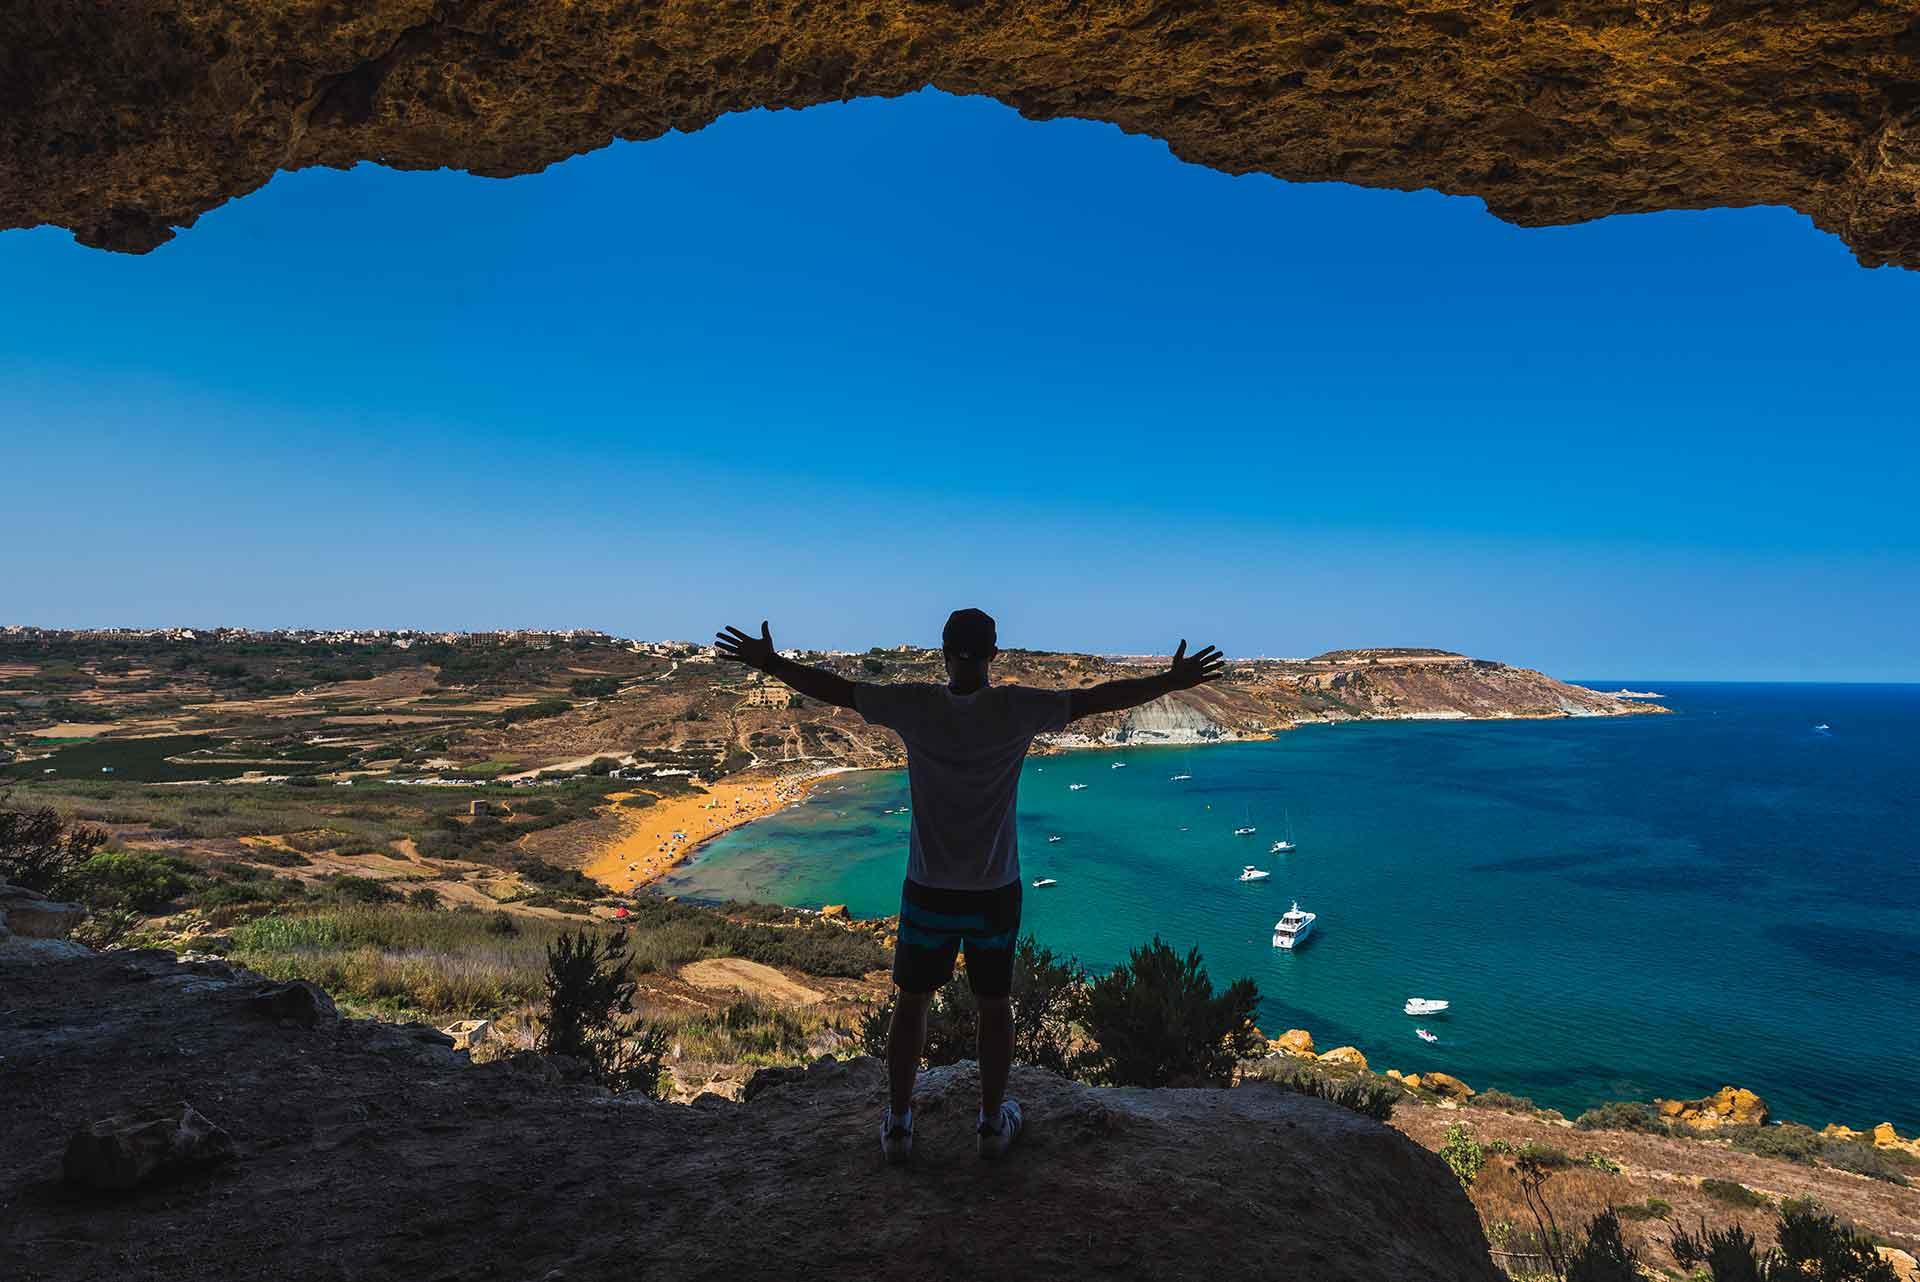 Enjoying-Mixta-Cave-in-Nadur